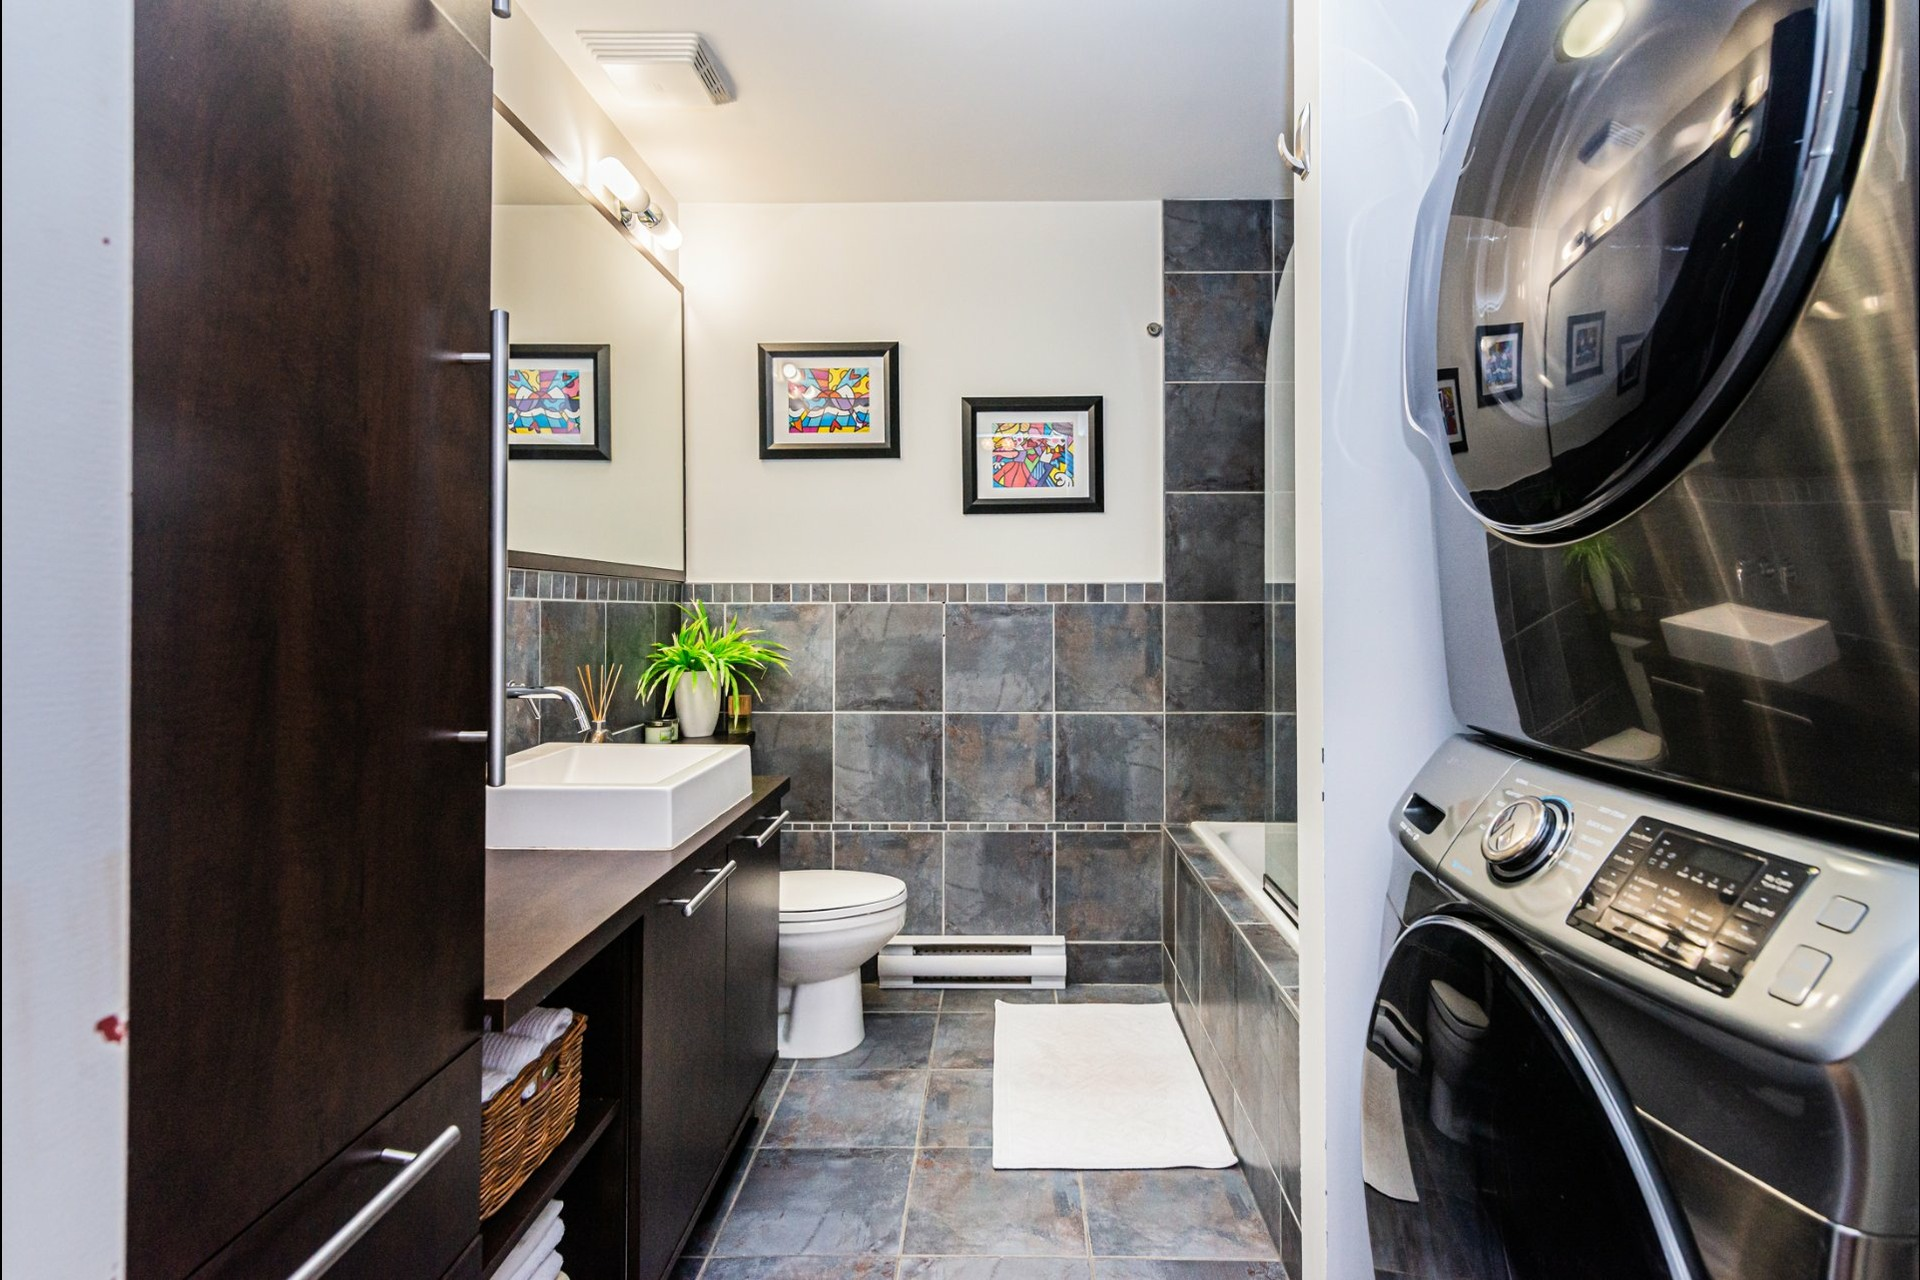 image 9 - Departamento En venta Saint-Laurent Montréal  - 4 habitaciones